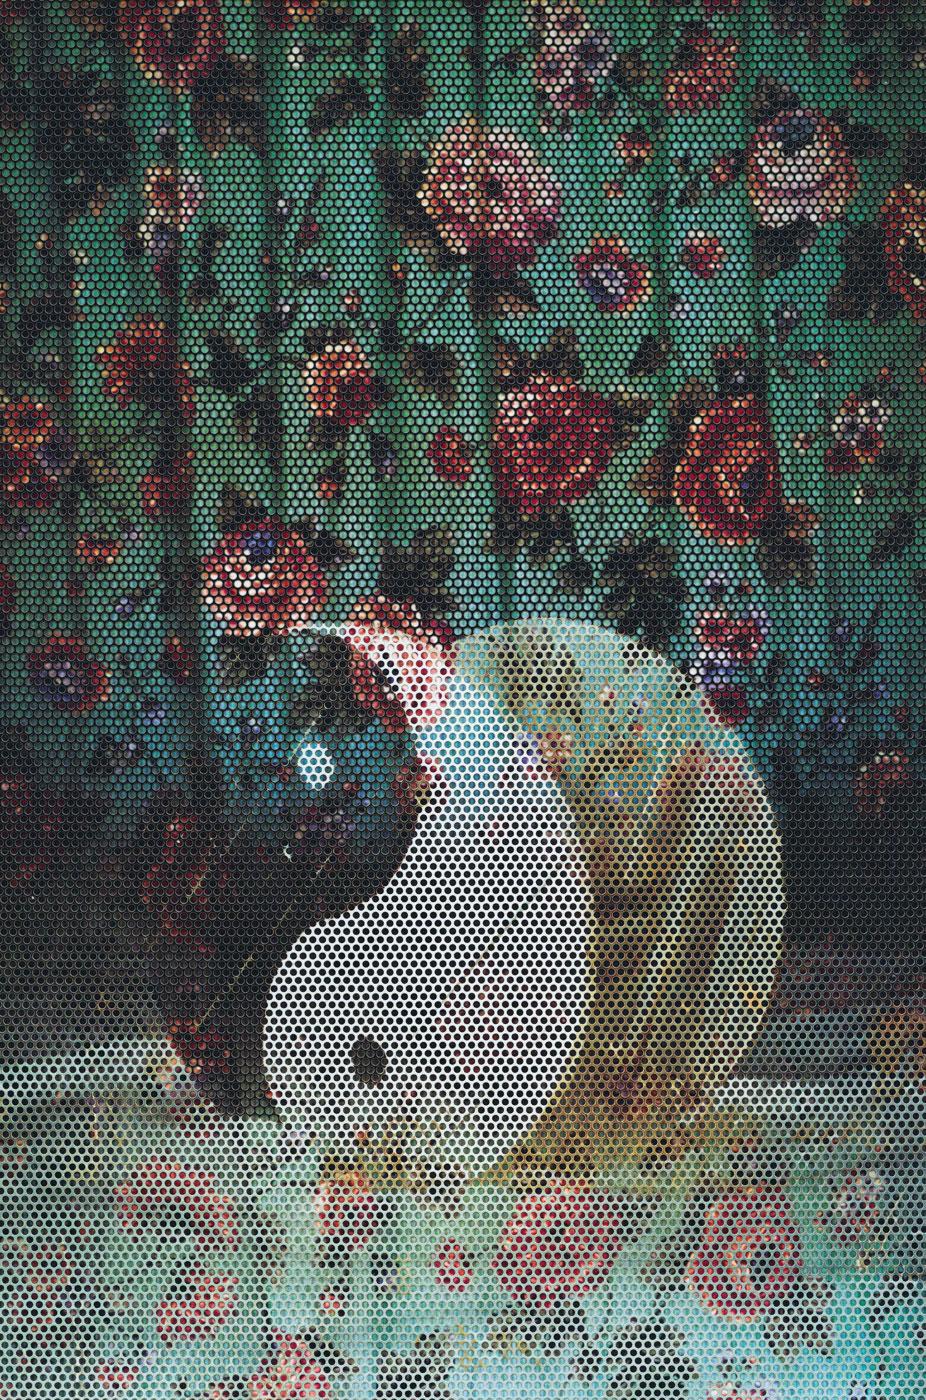 Untitled-4.4.jpg